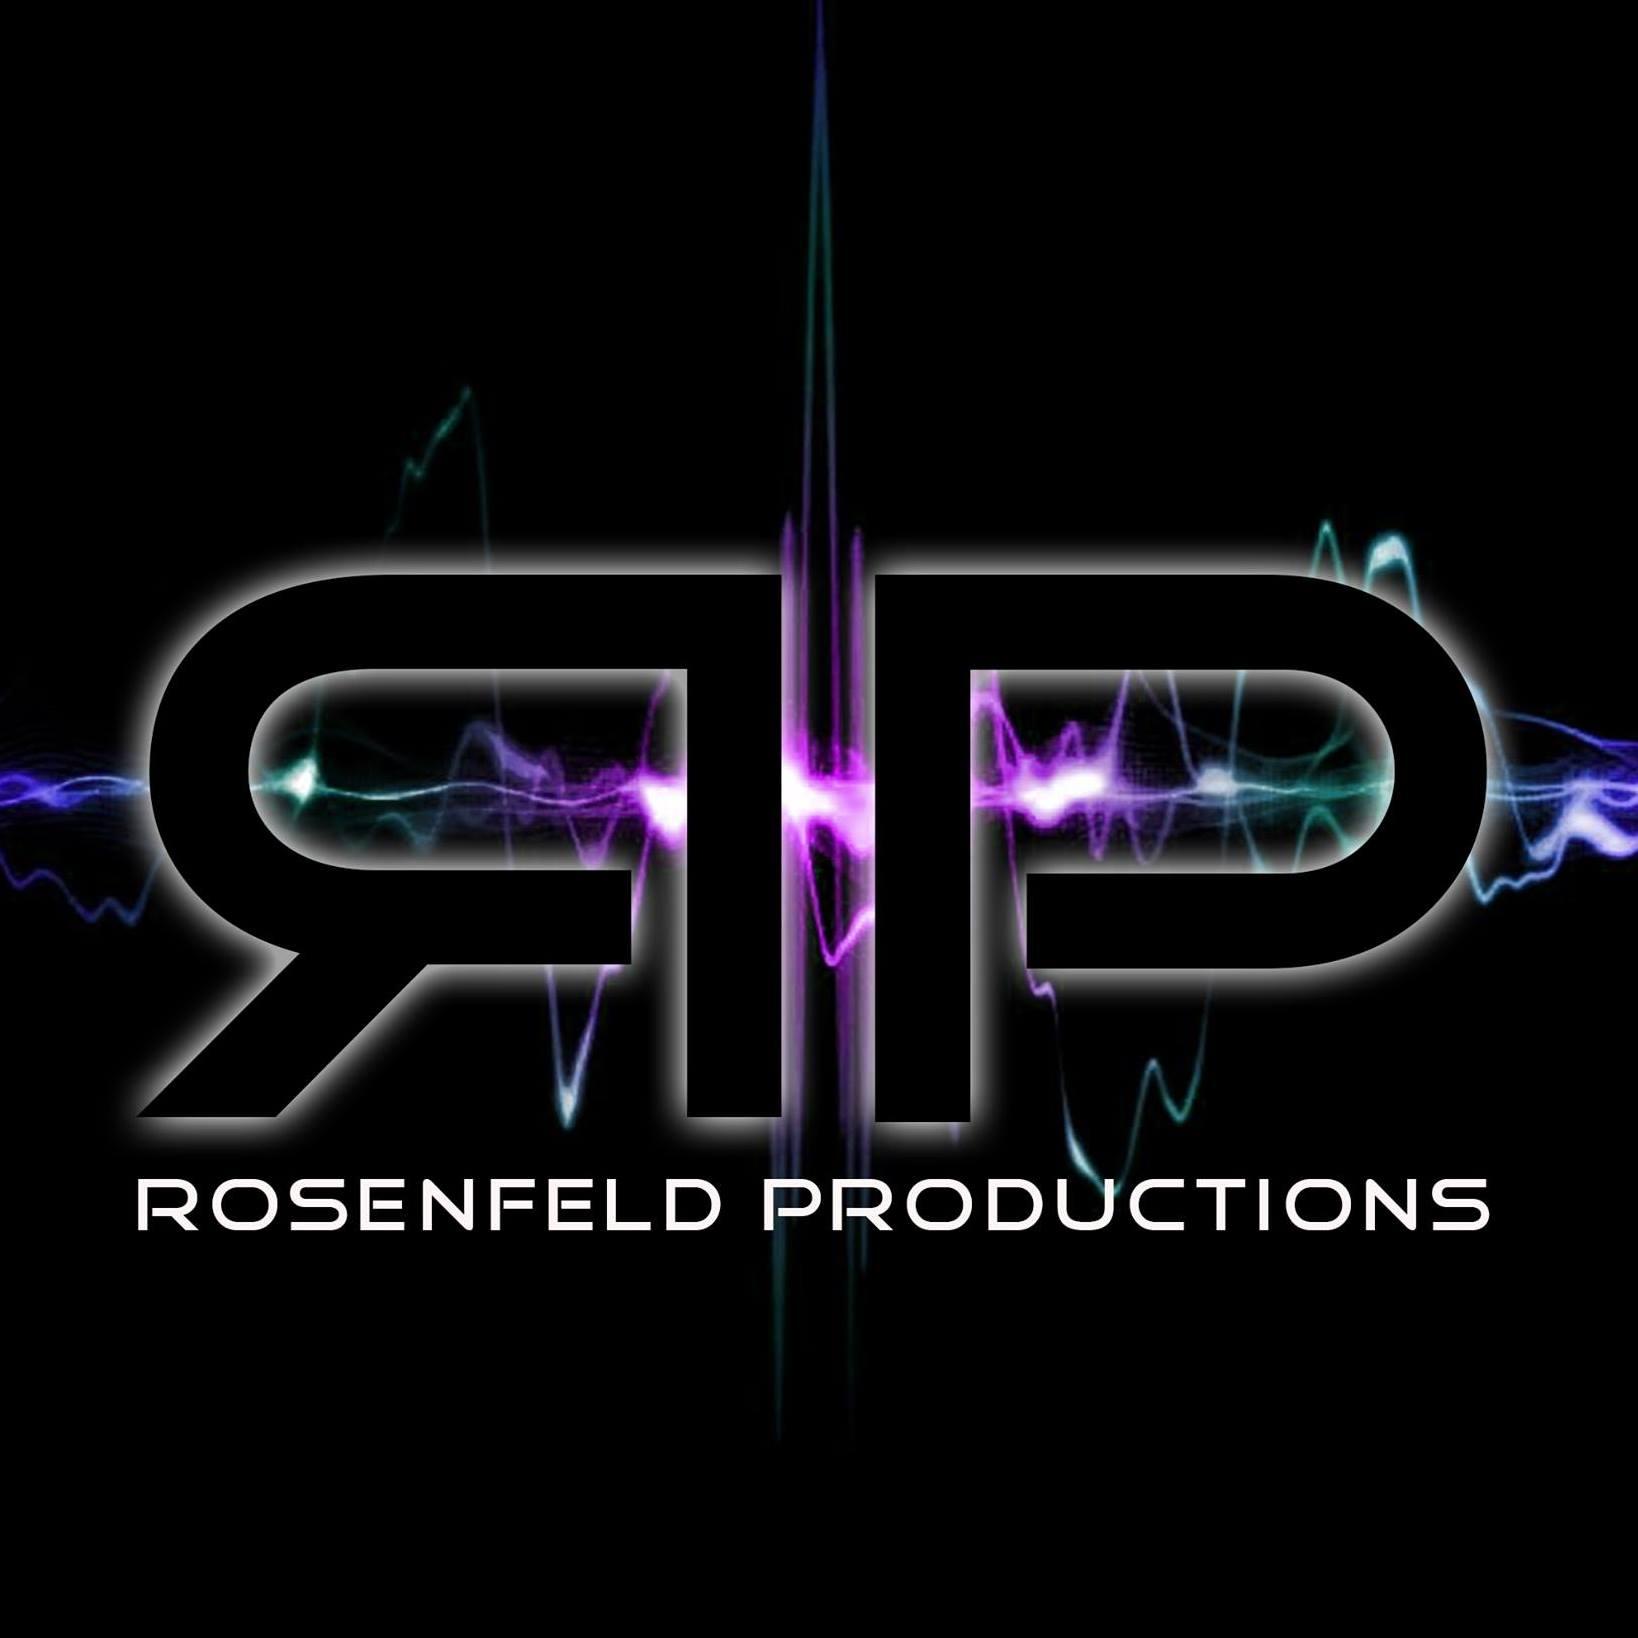 Rosenfeld Productions